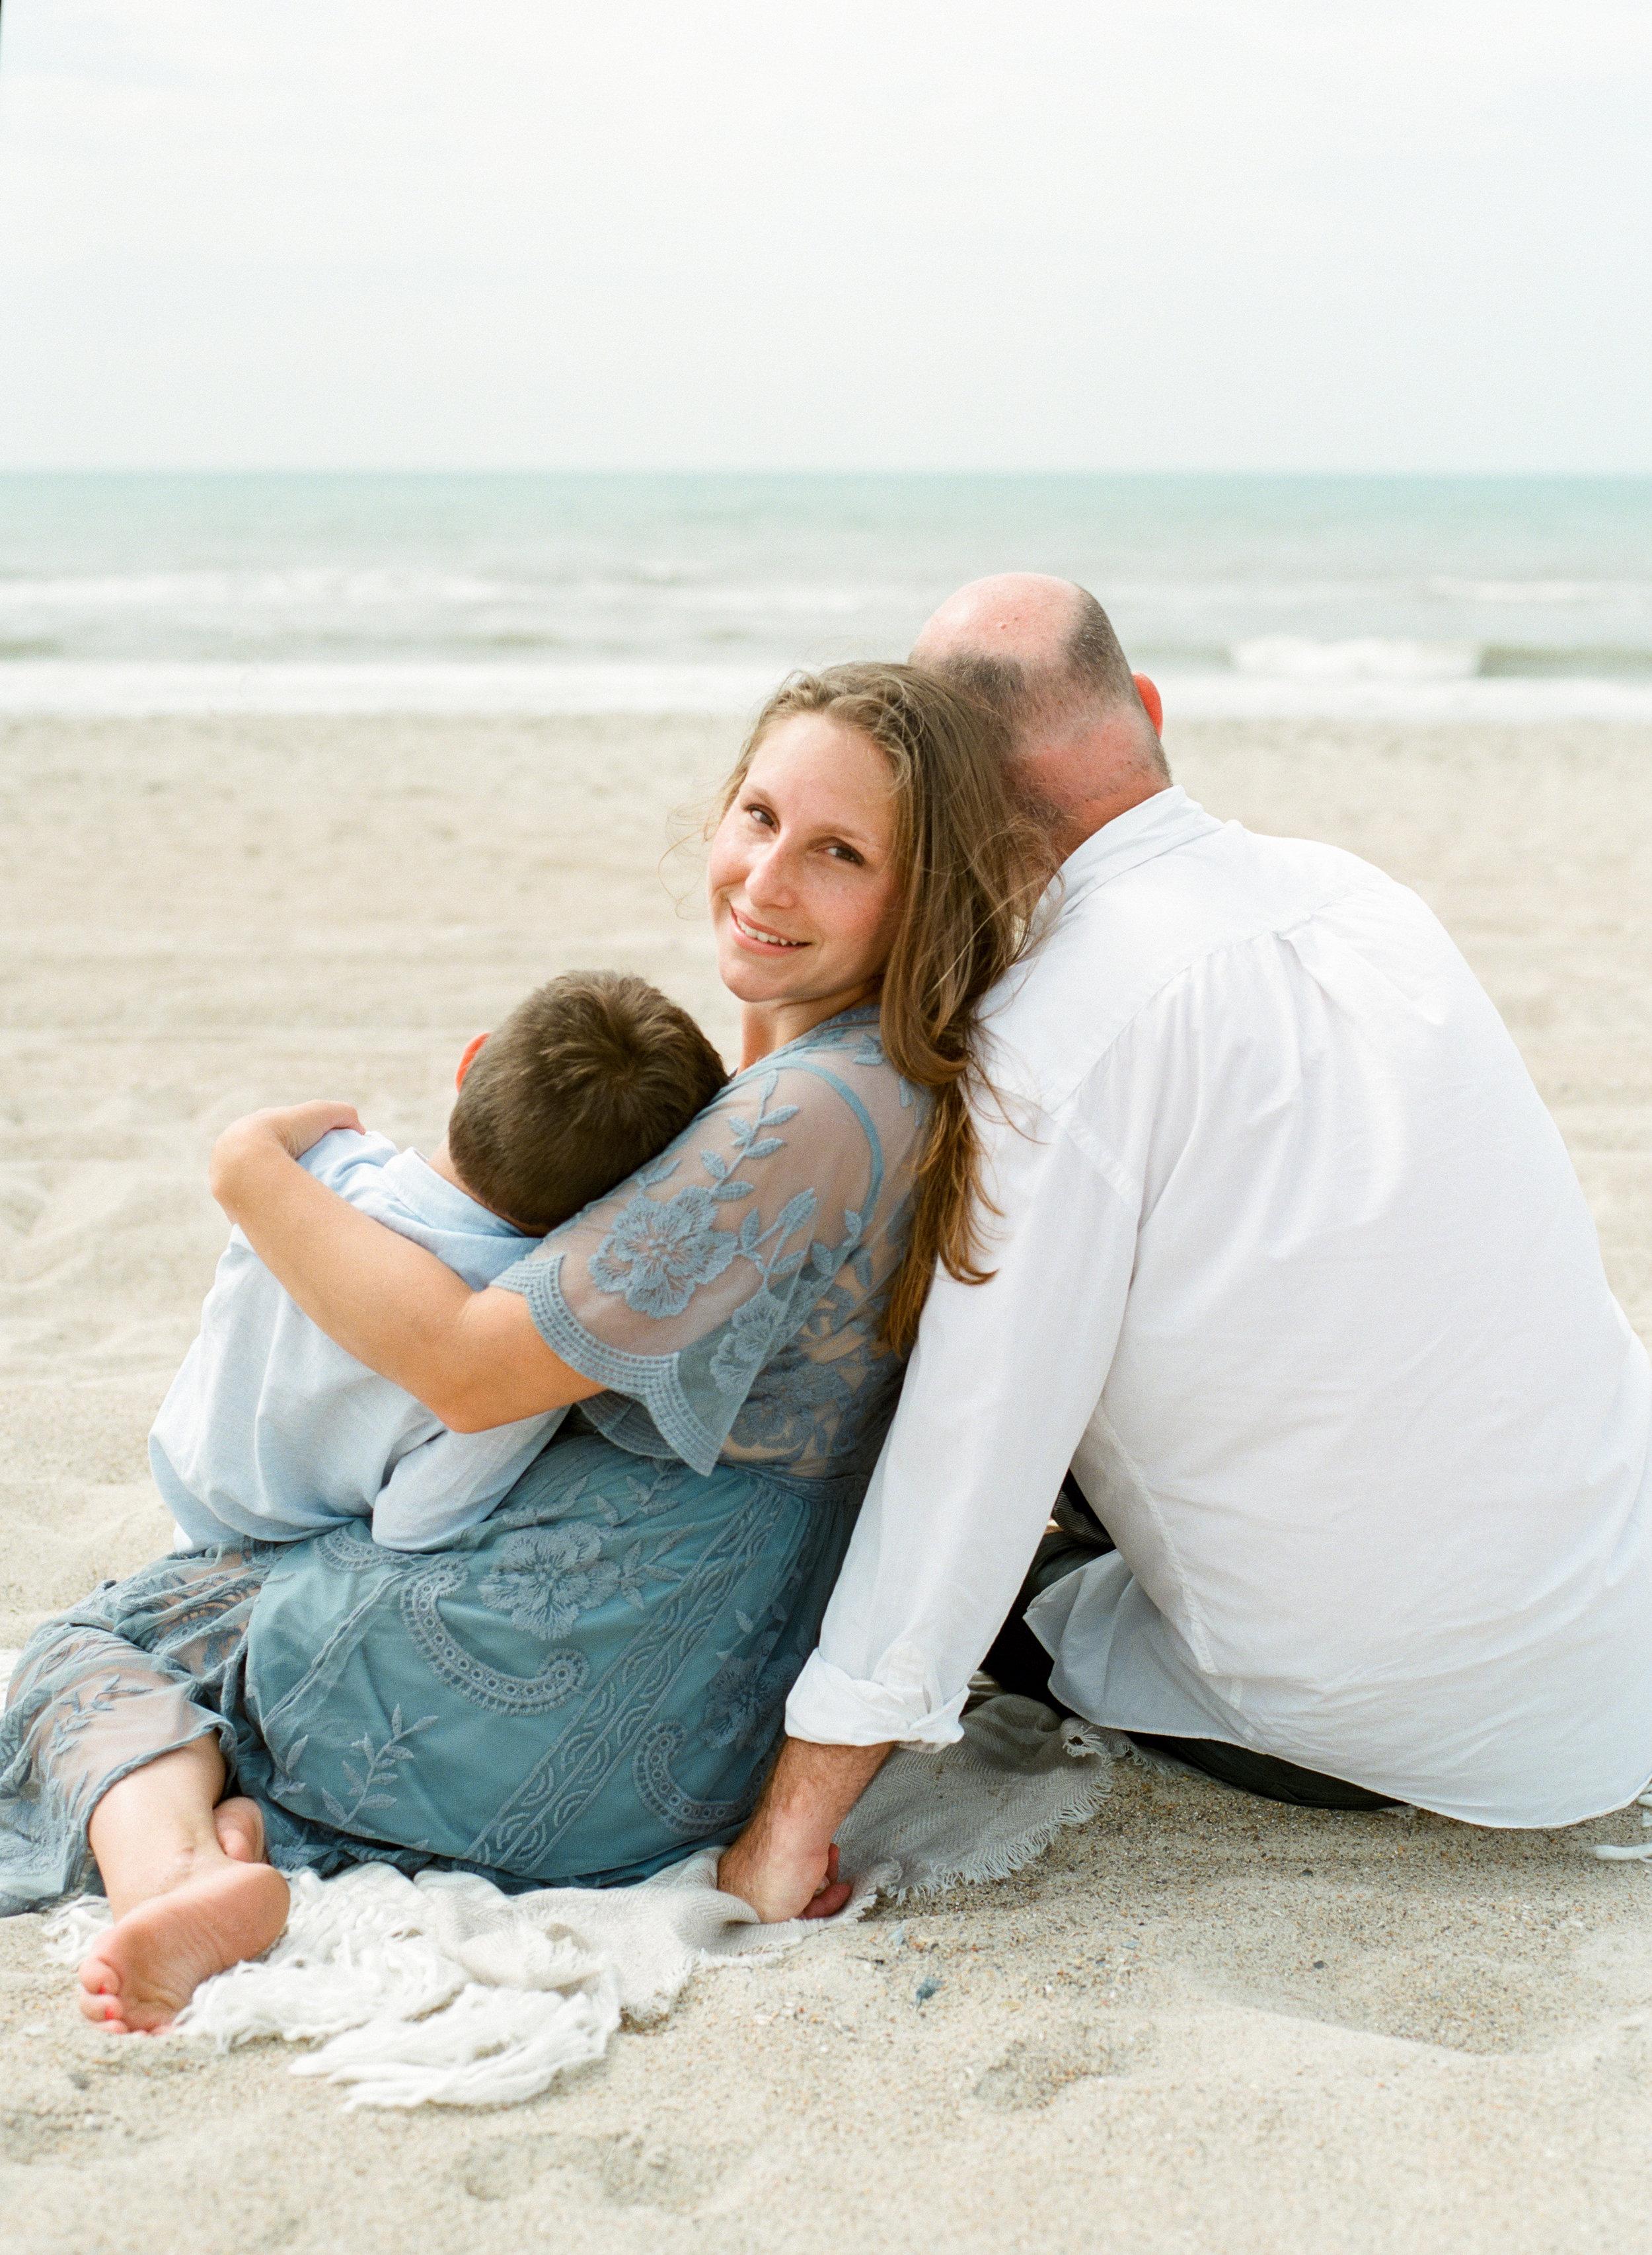 emerald-isle-beach-family-film-photographer-lifestyleemerald-isle-beach-family-film-photographer-lifestyle